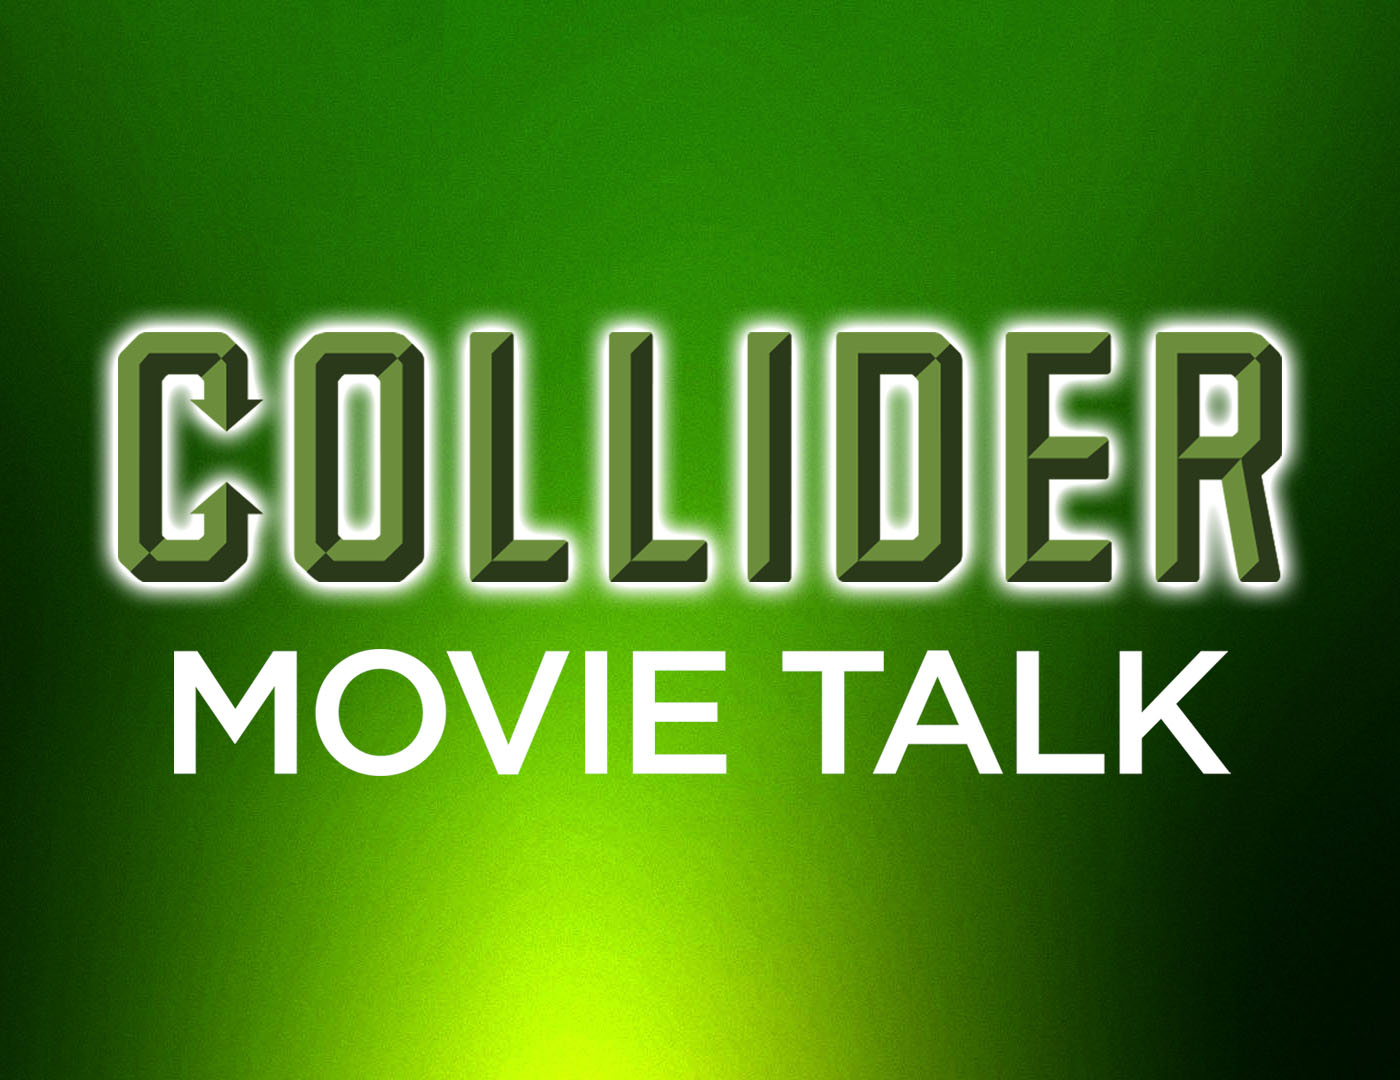 Collider Movie Talk - Captain Phasma Returning, Deadpool does Superbowl